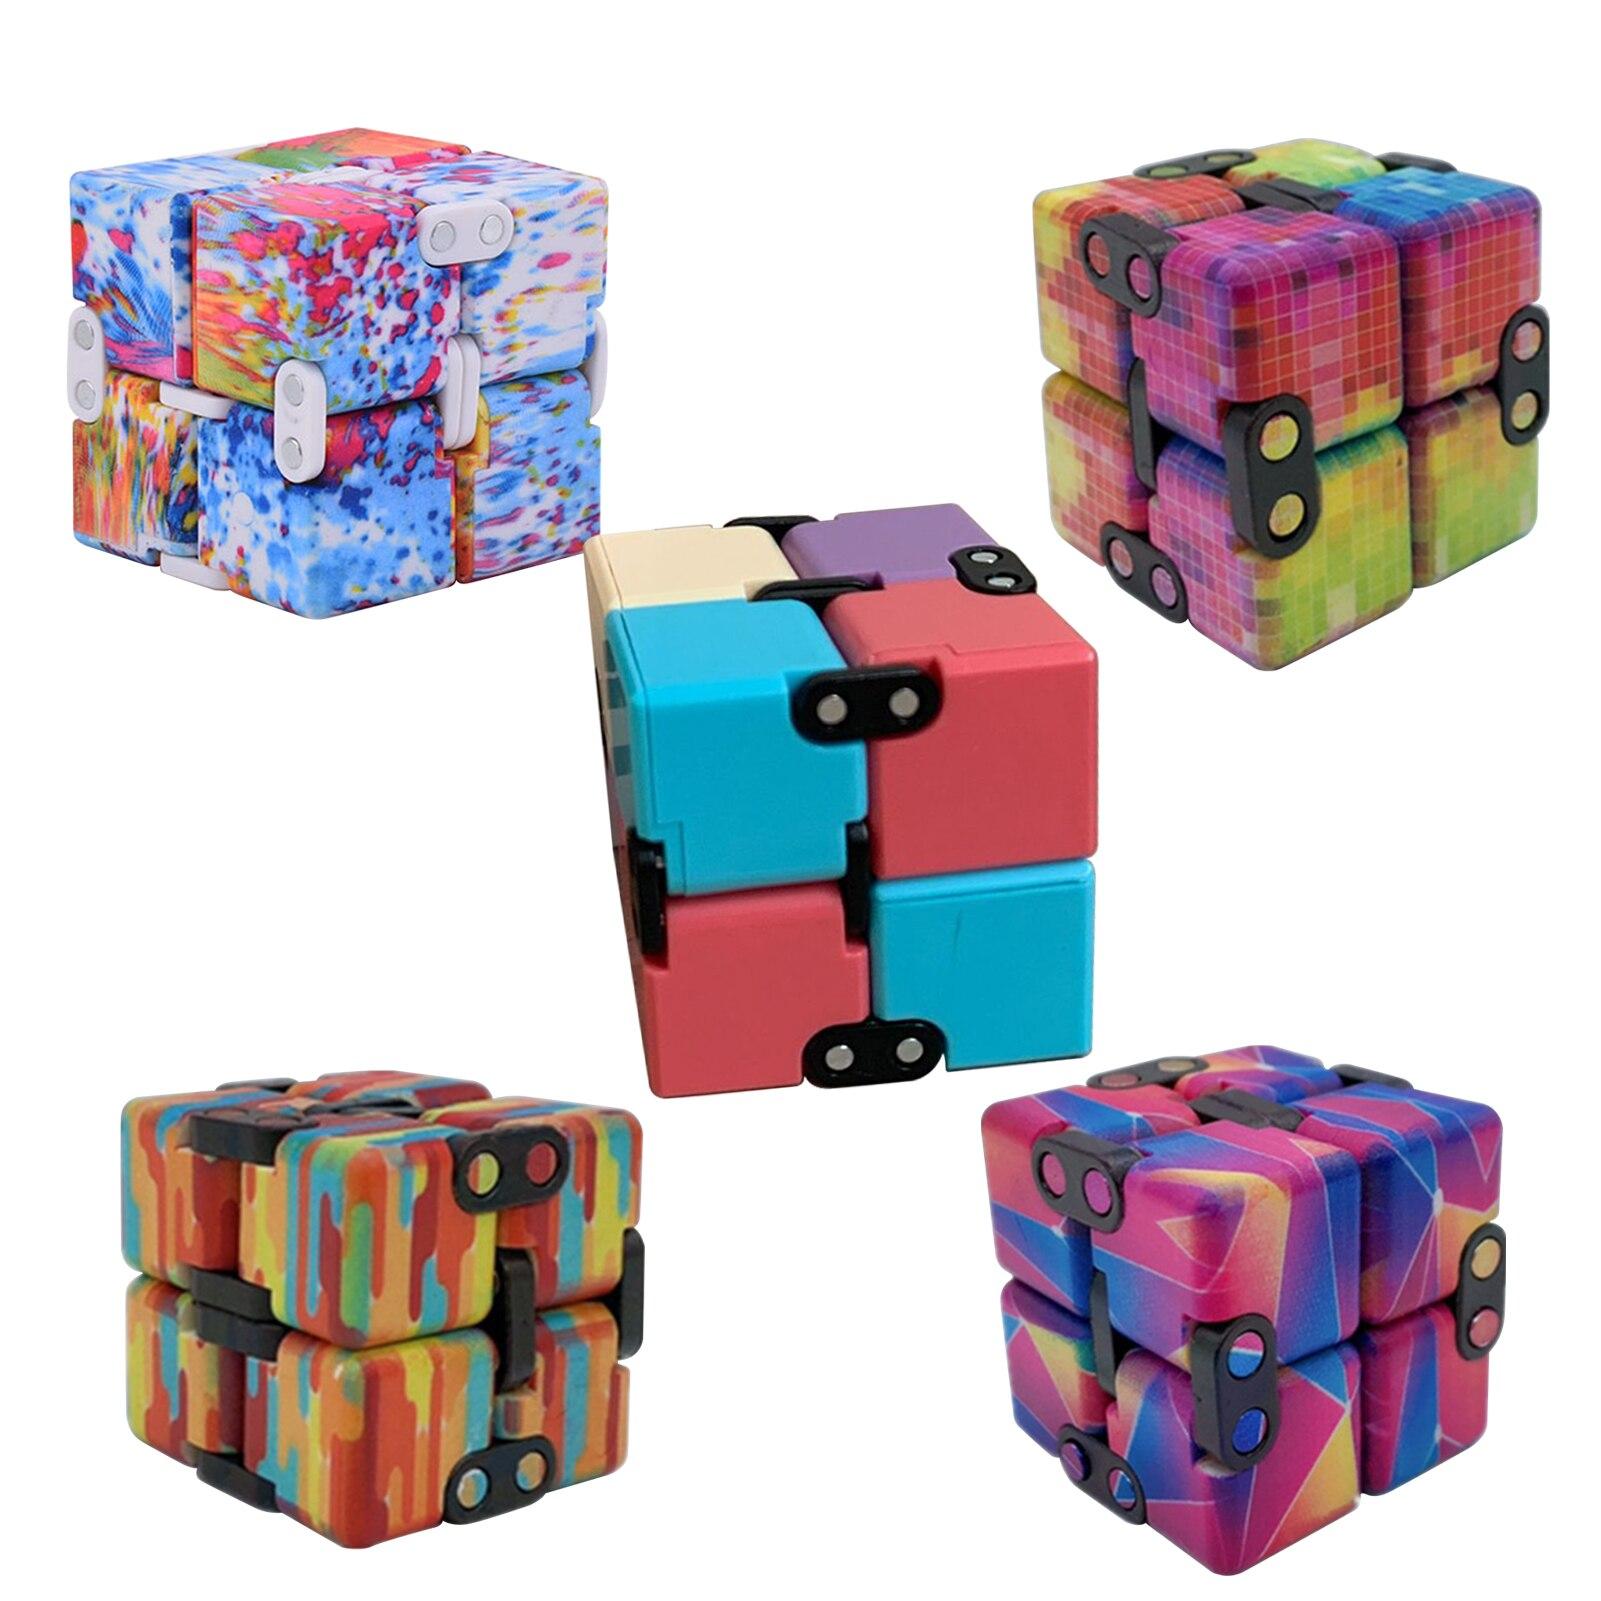 infinity cube cube block fidget toy 6643 - Wacky Track